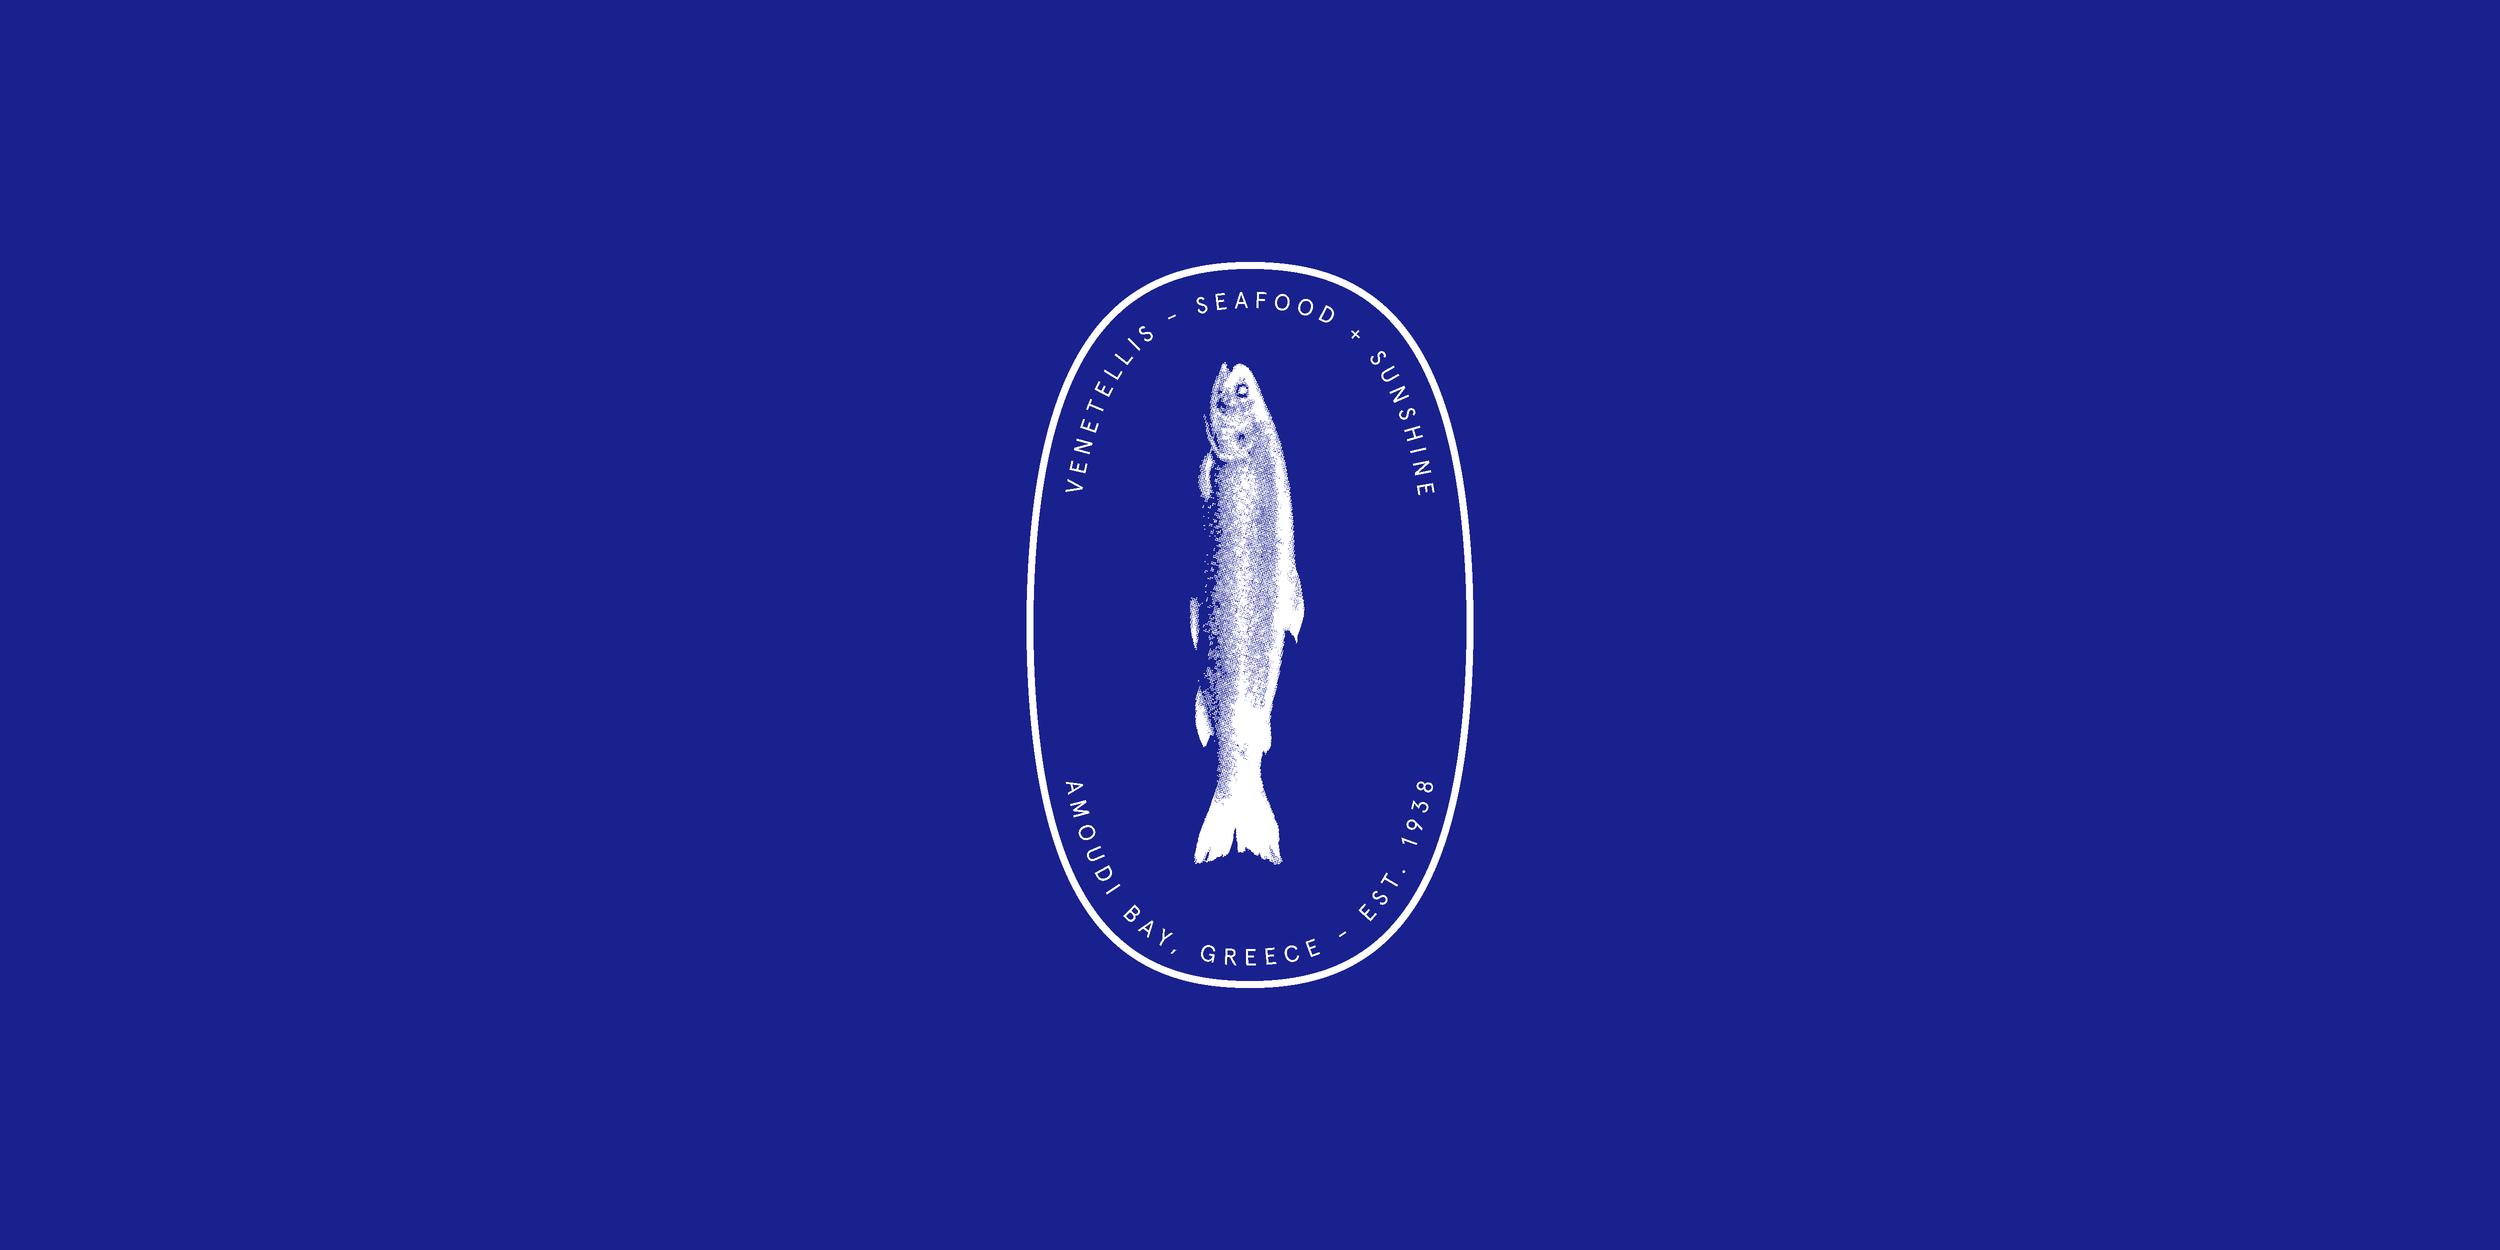 venetellis-branding-15.png